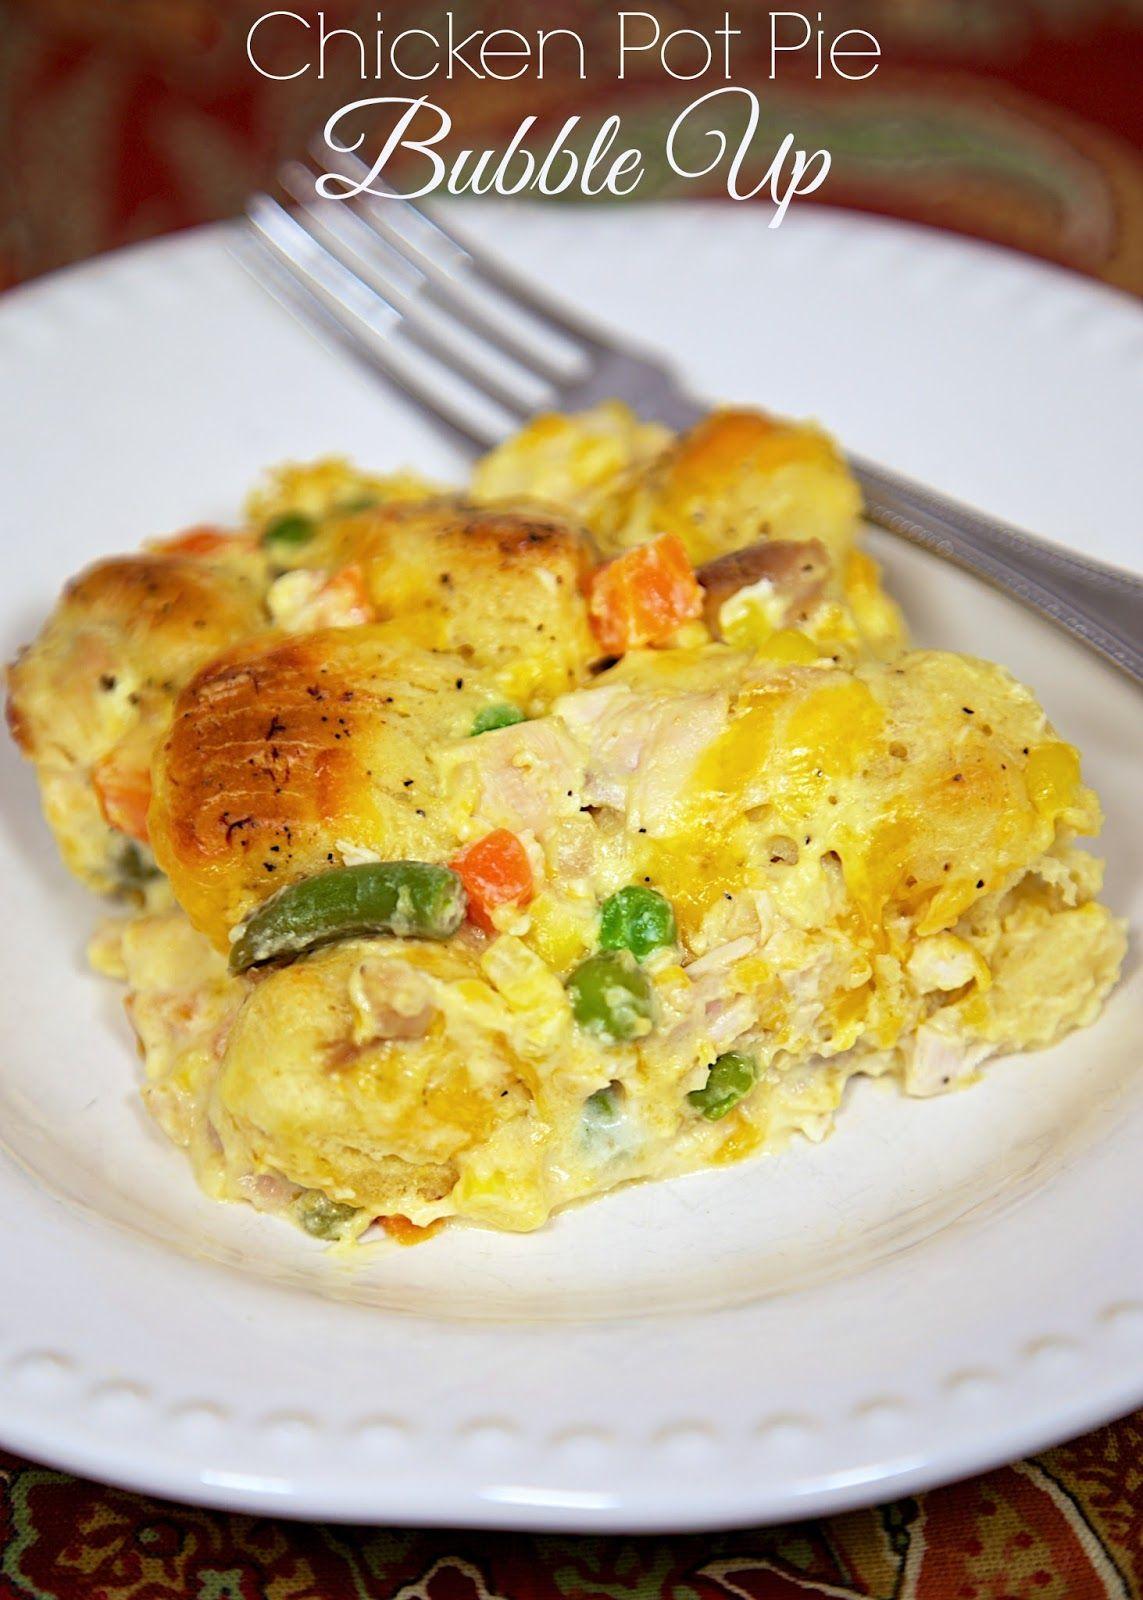 Chicken Pot Pie Bubble Up Recipes Chicken Recipes Chicken Pot Pie Recipes